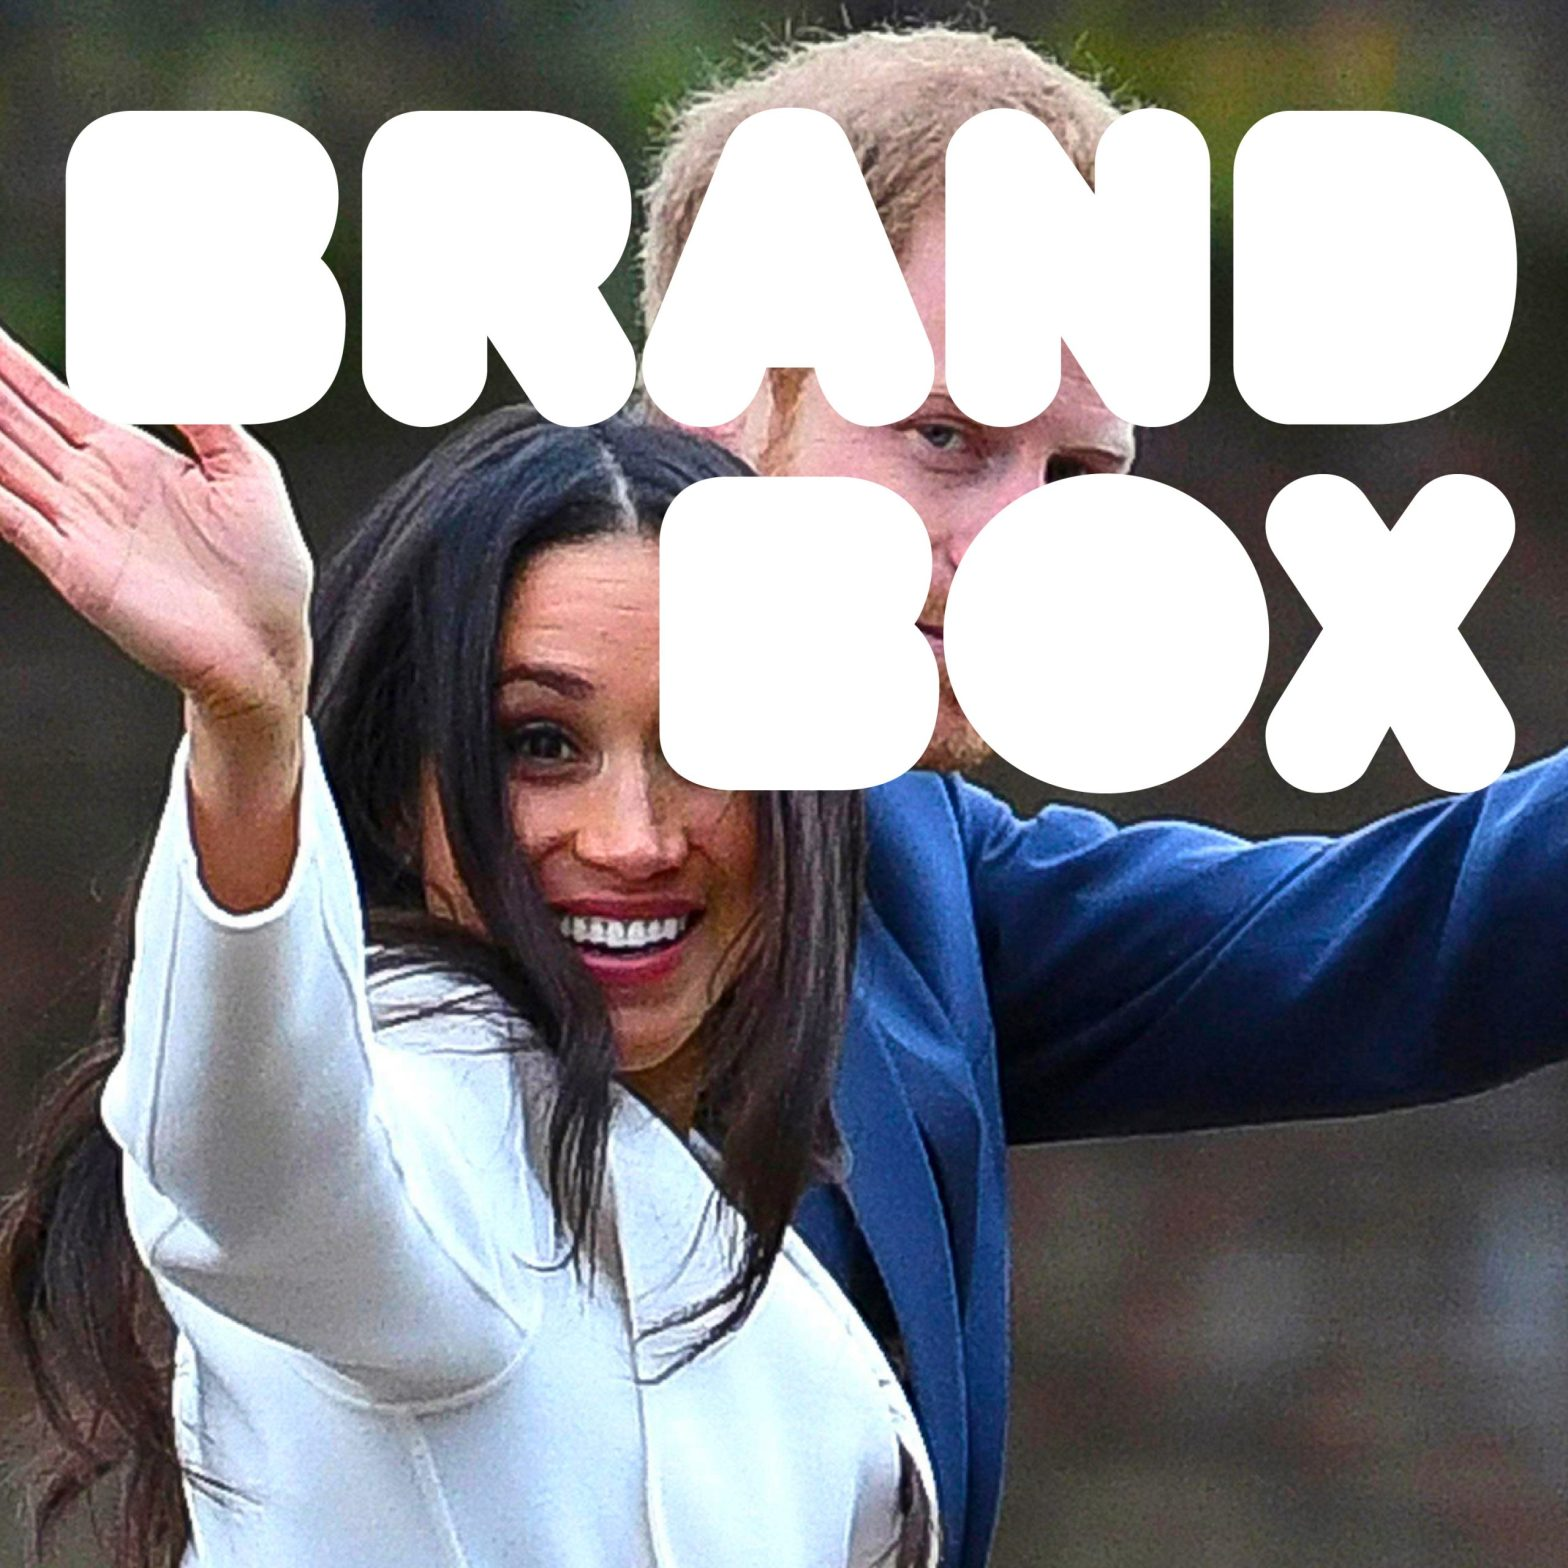 Thumbnail for Meghan and Harry, Through the Lens of Branding